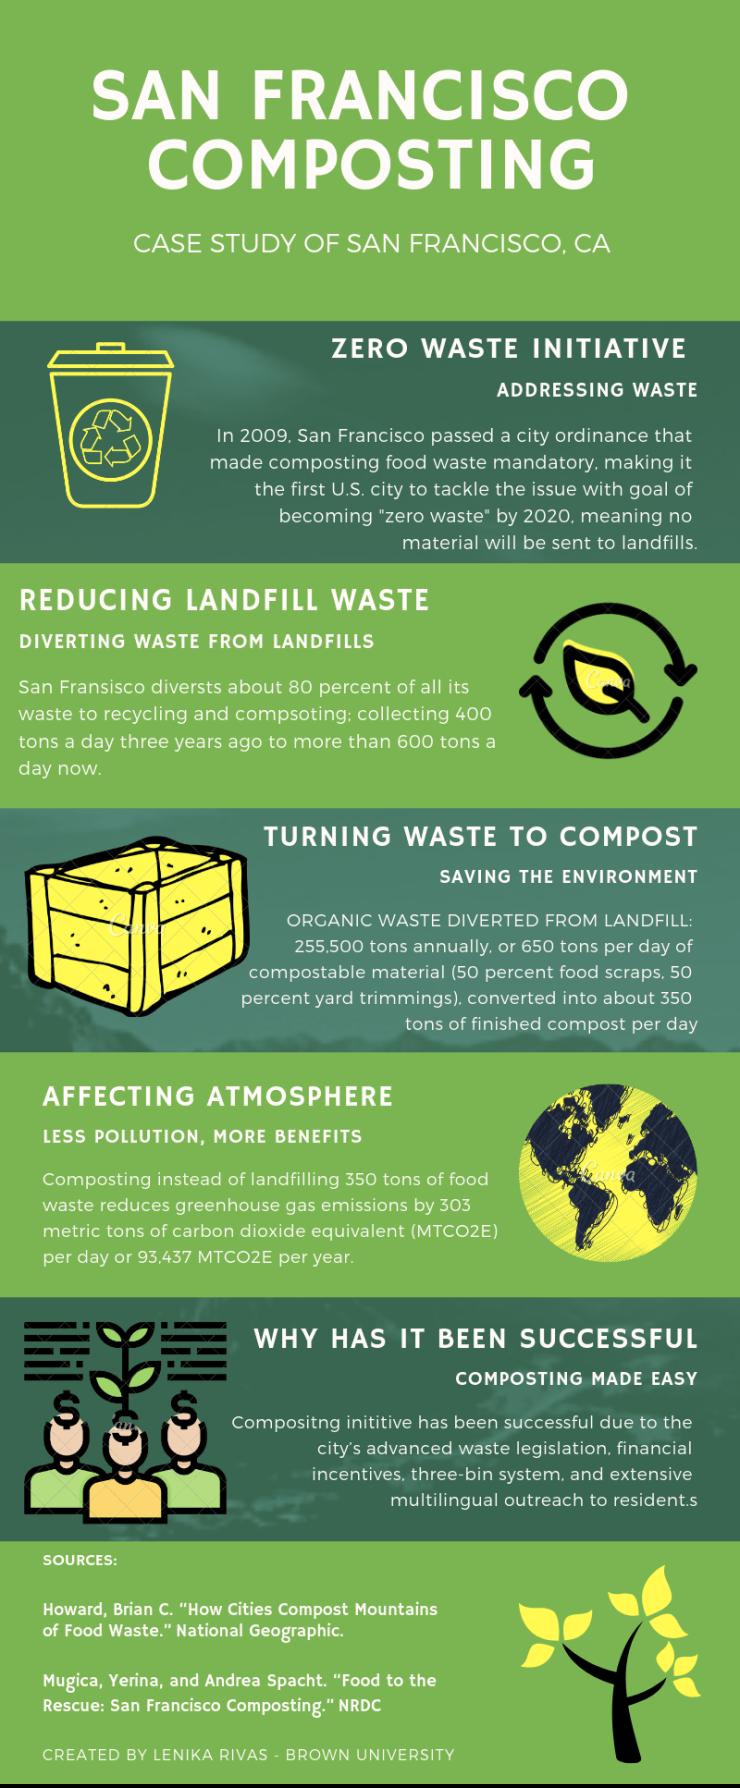 San fransicso composting